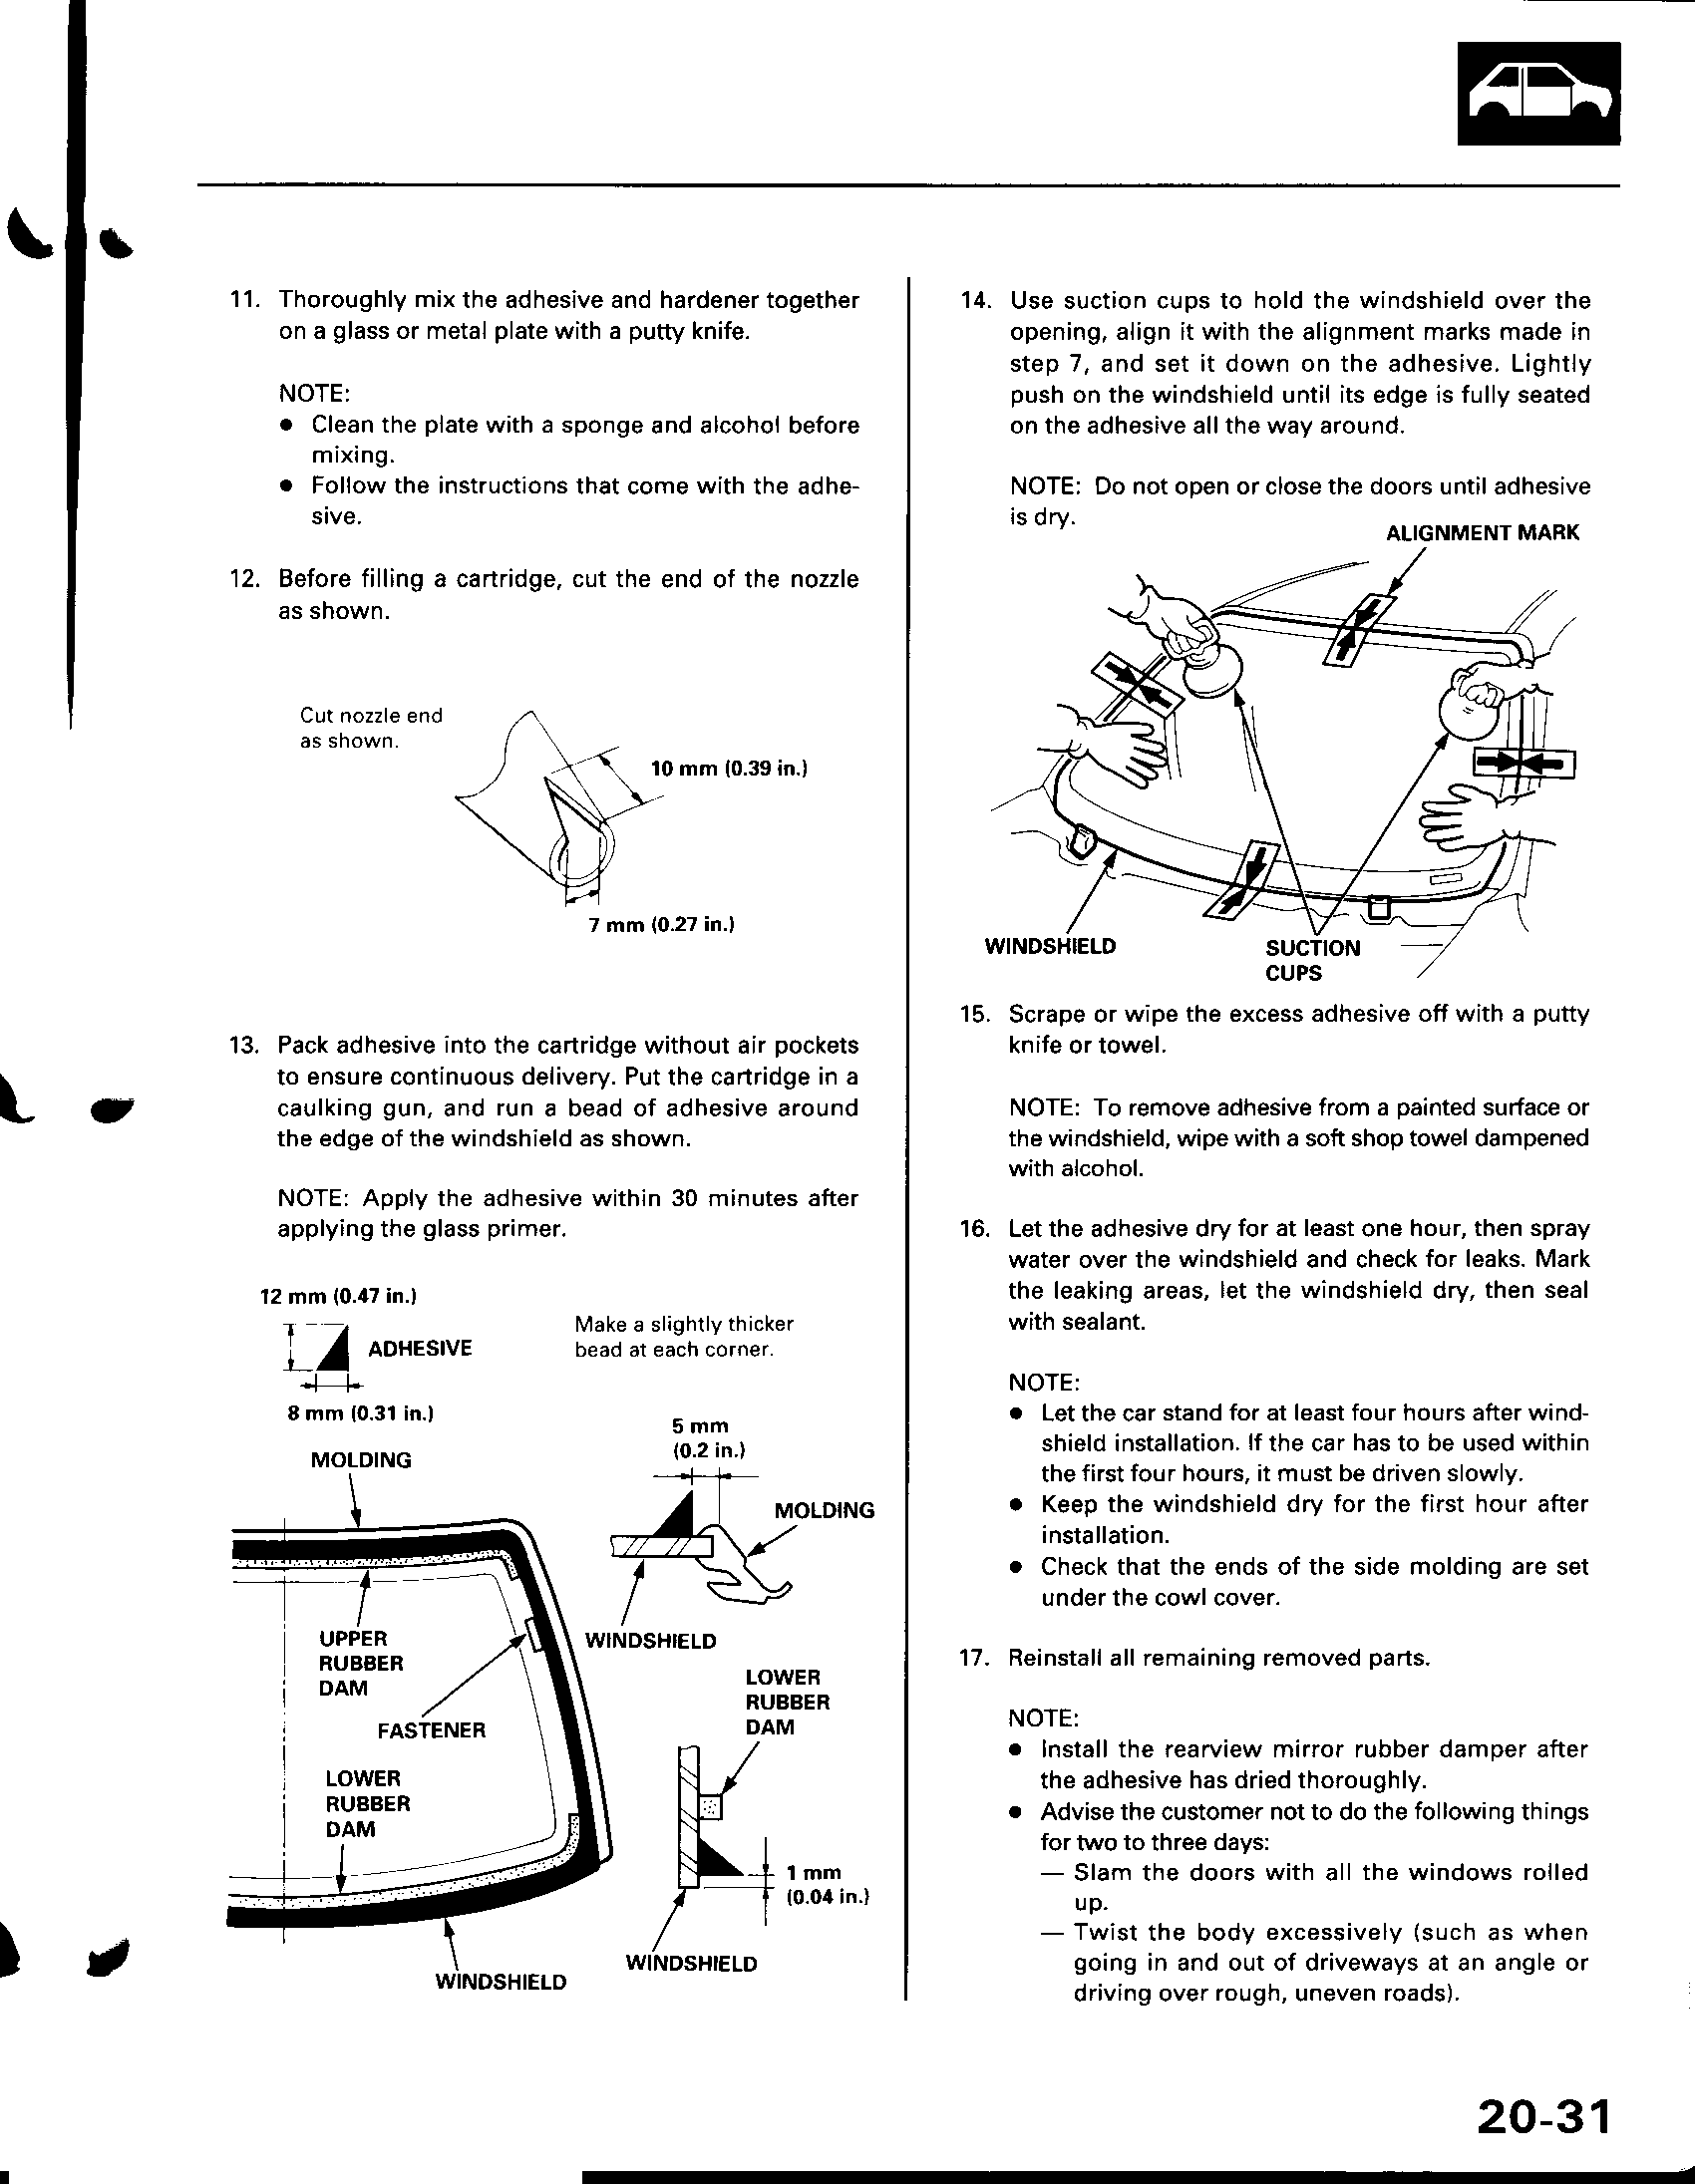 Honda Civic Service Manual ManualsLib Makes It Easy To Find Manuals